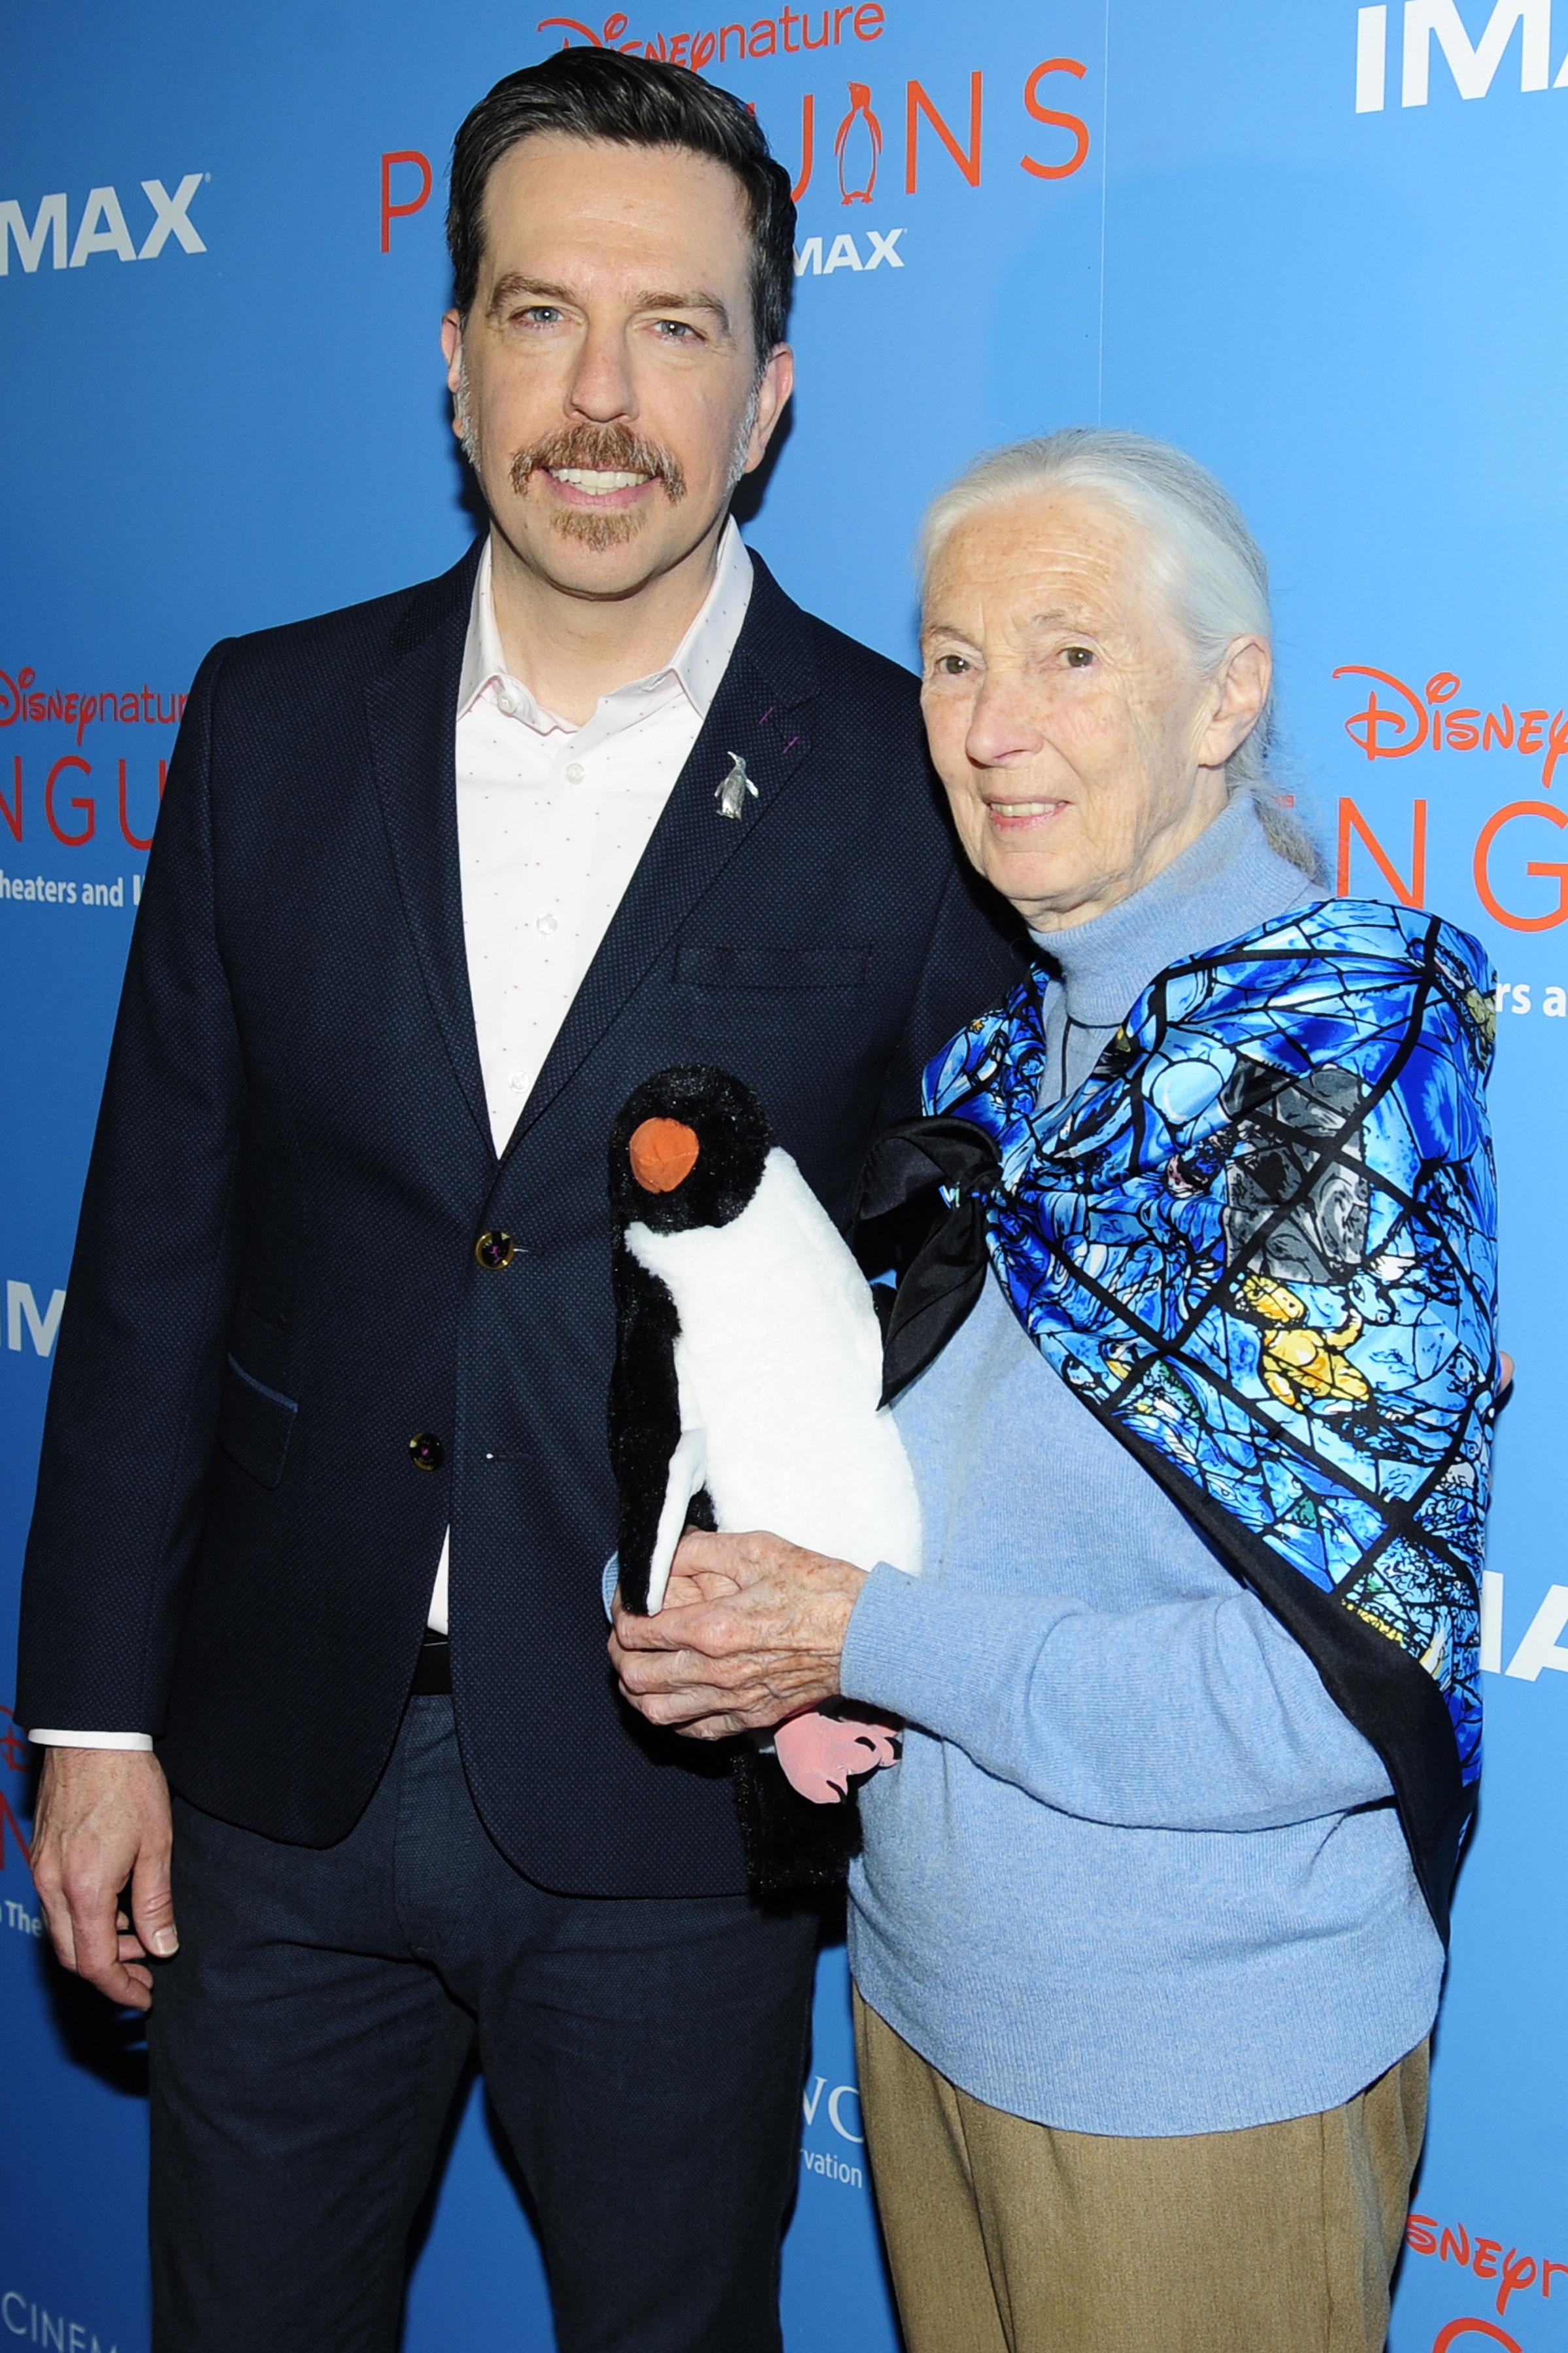 Ed Helms Jane Goodall - Ed Helms and Jane Goodall.